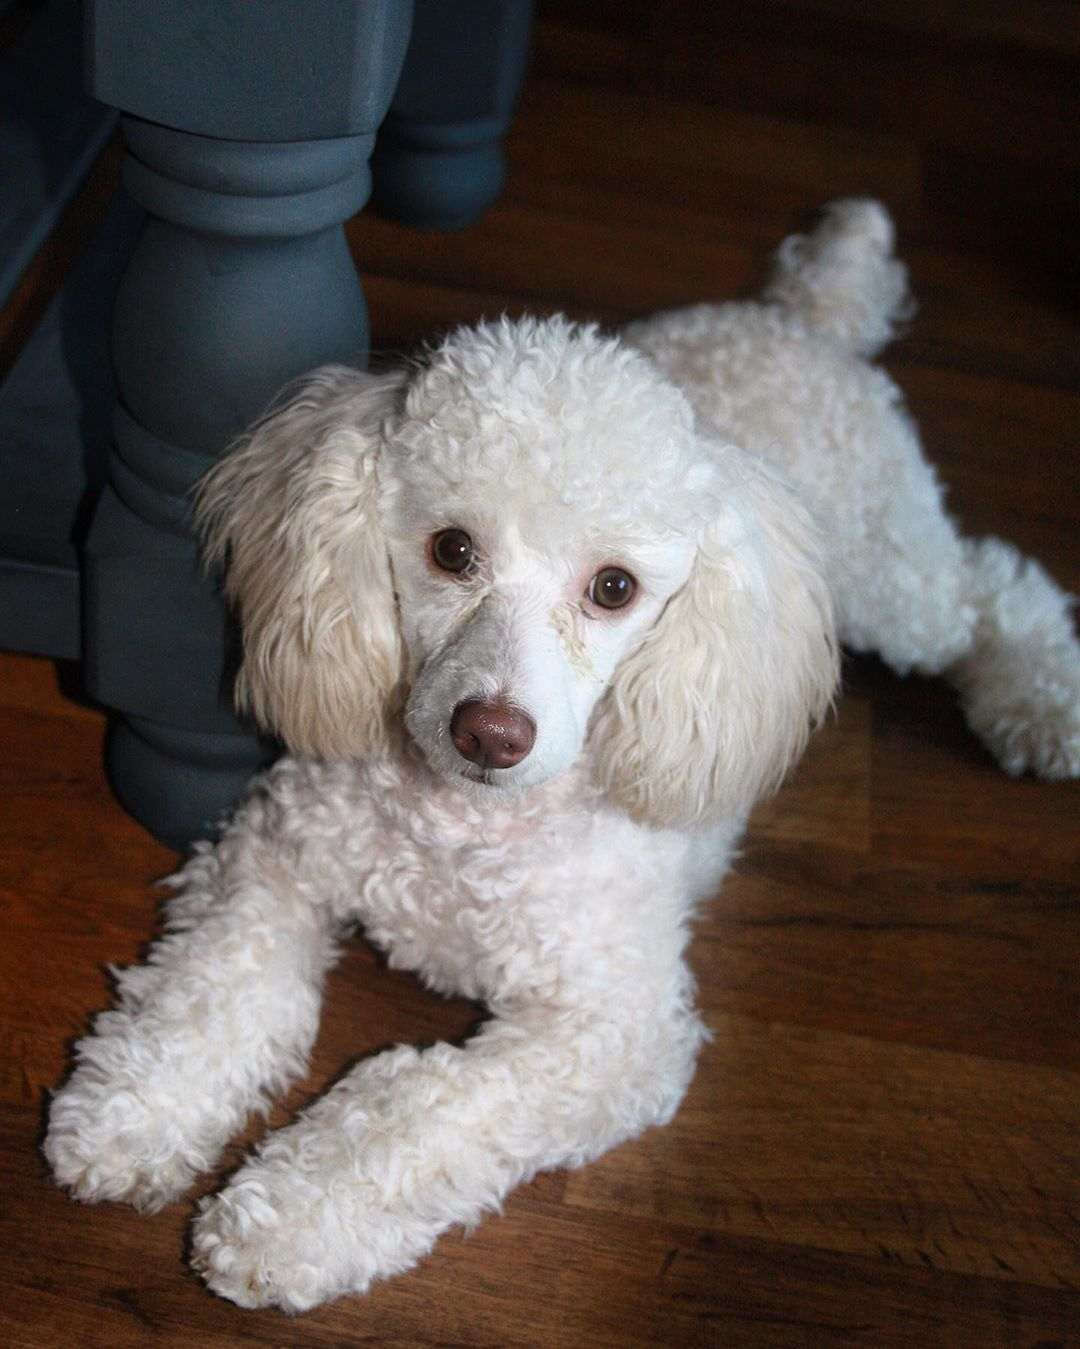 seriously mom?  #toypoodle #poodlepuppy #poodle #whitepoodle #poodlesofinstagram #poodlelove #puppies...